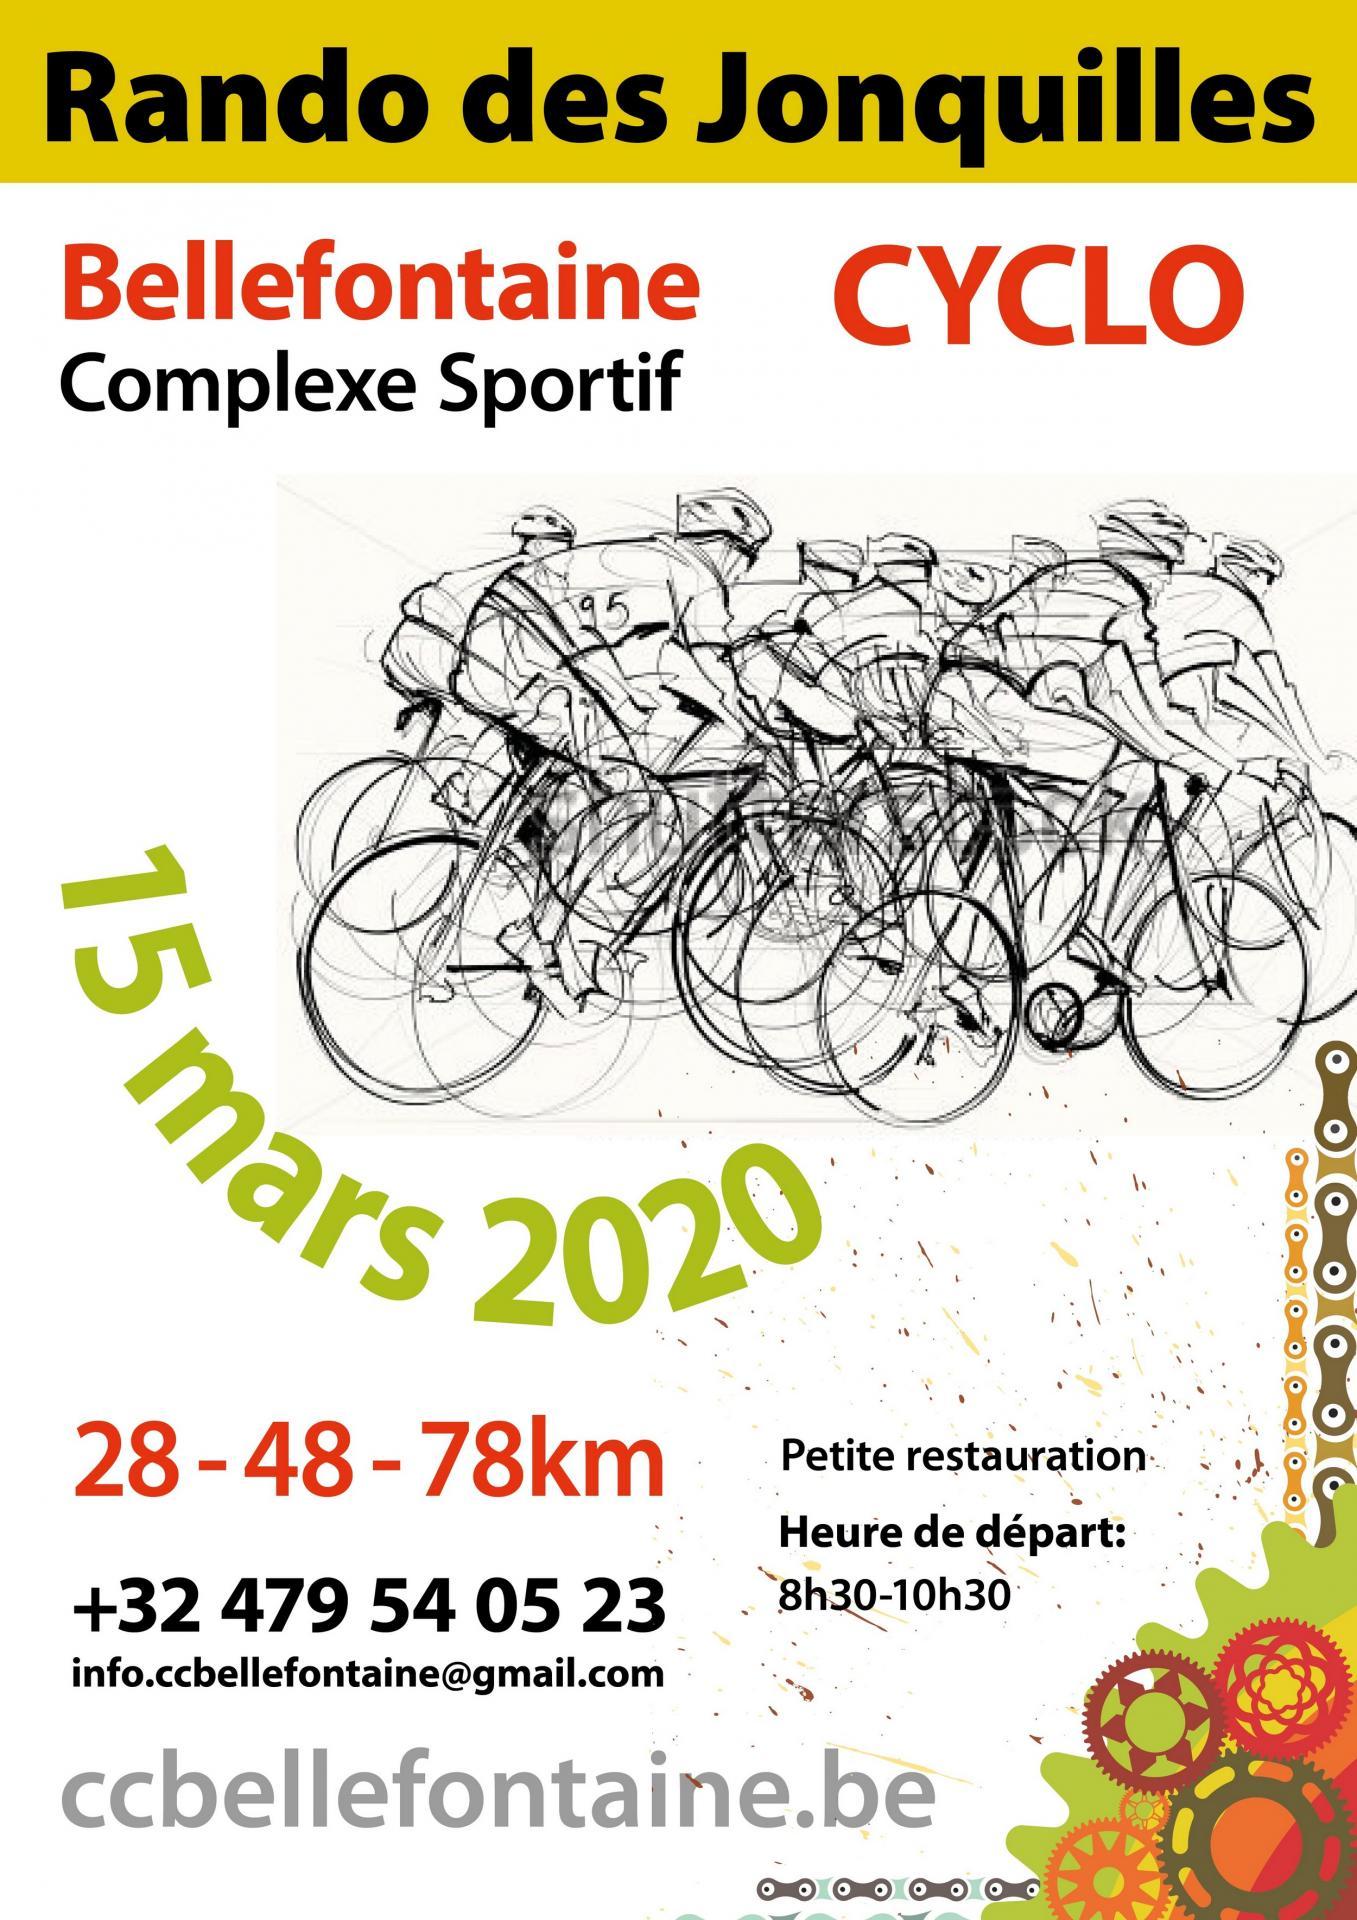 Ccb aff jonquilles 2022